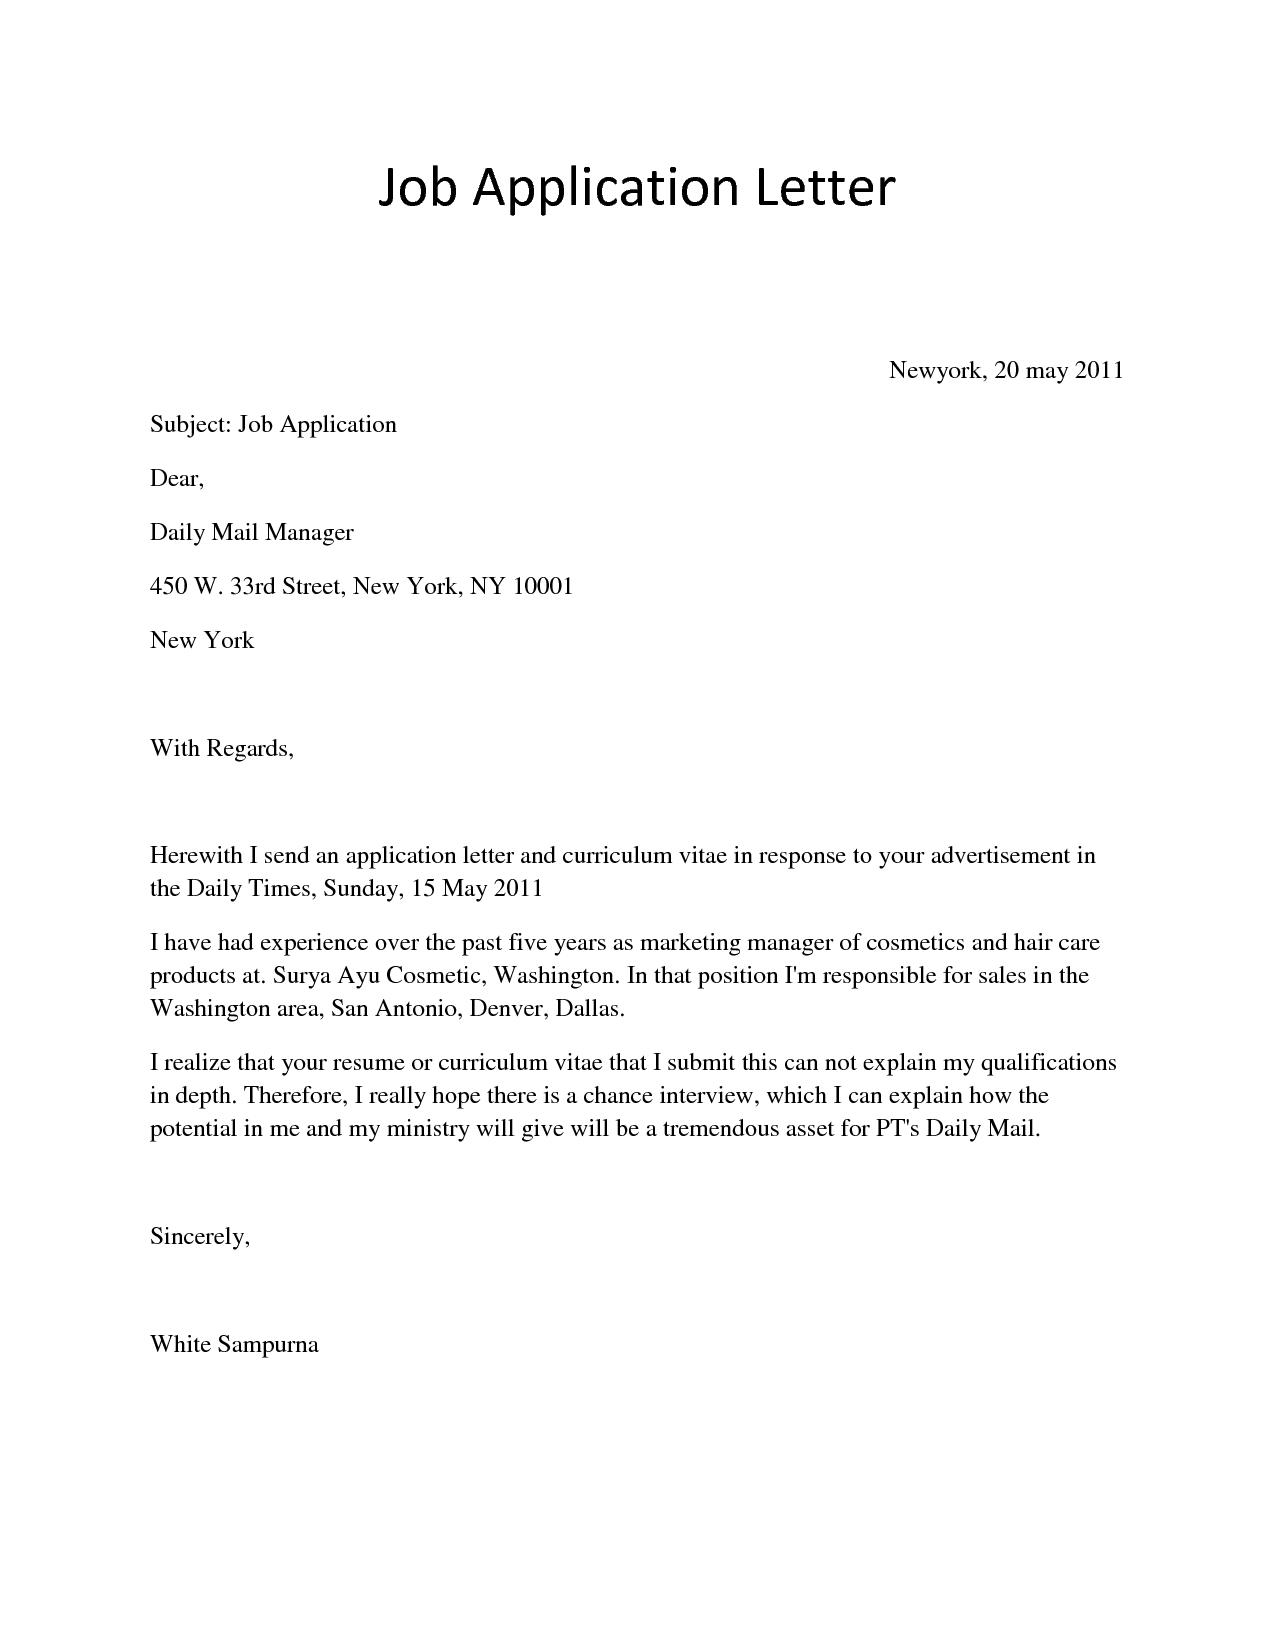 application letter example IMBK8UnK | hrm | Pinterest